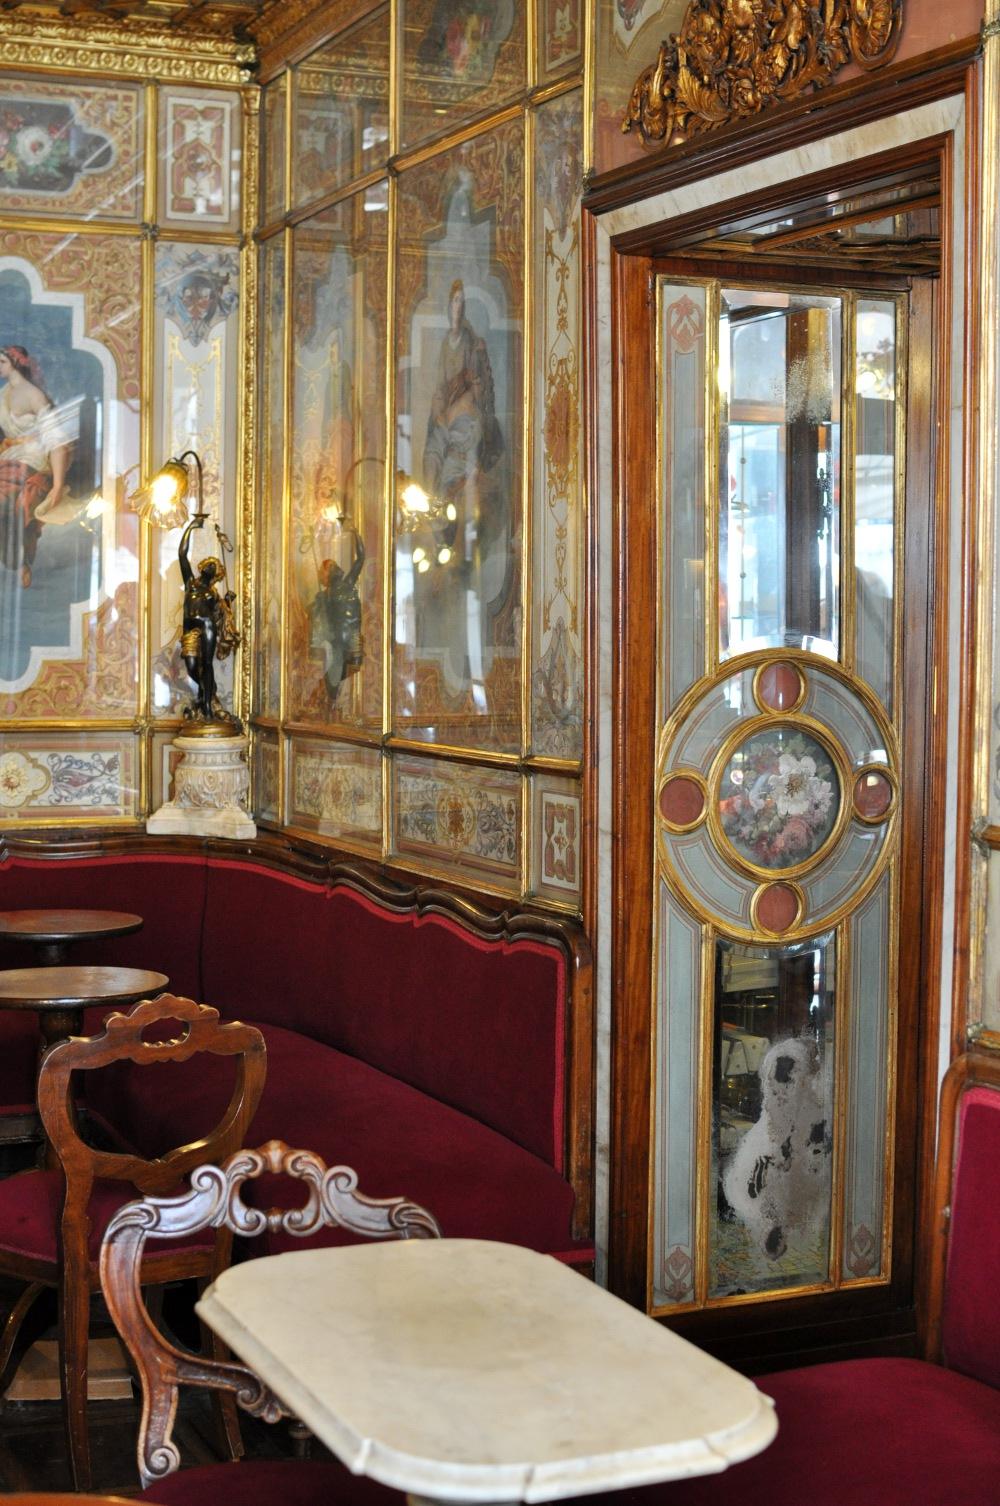 rocaille-blog-venezia-redentore (20)